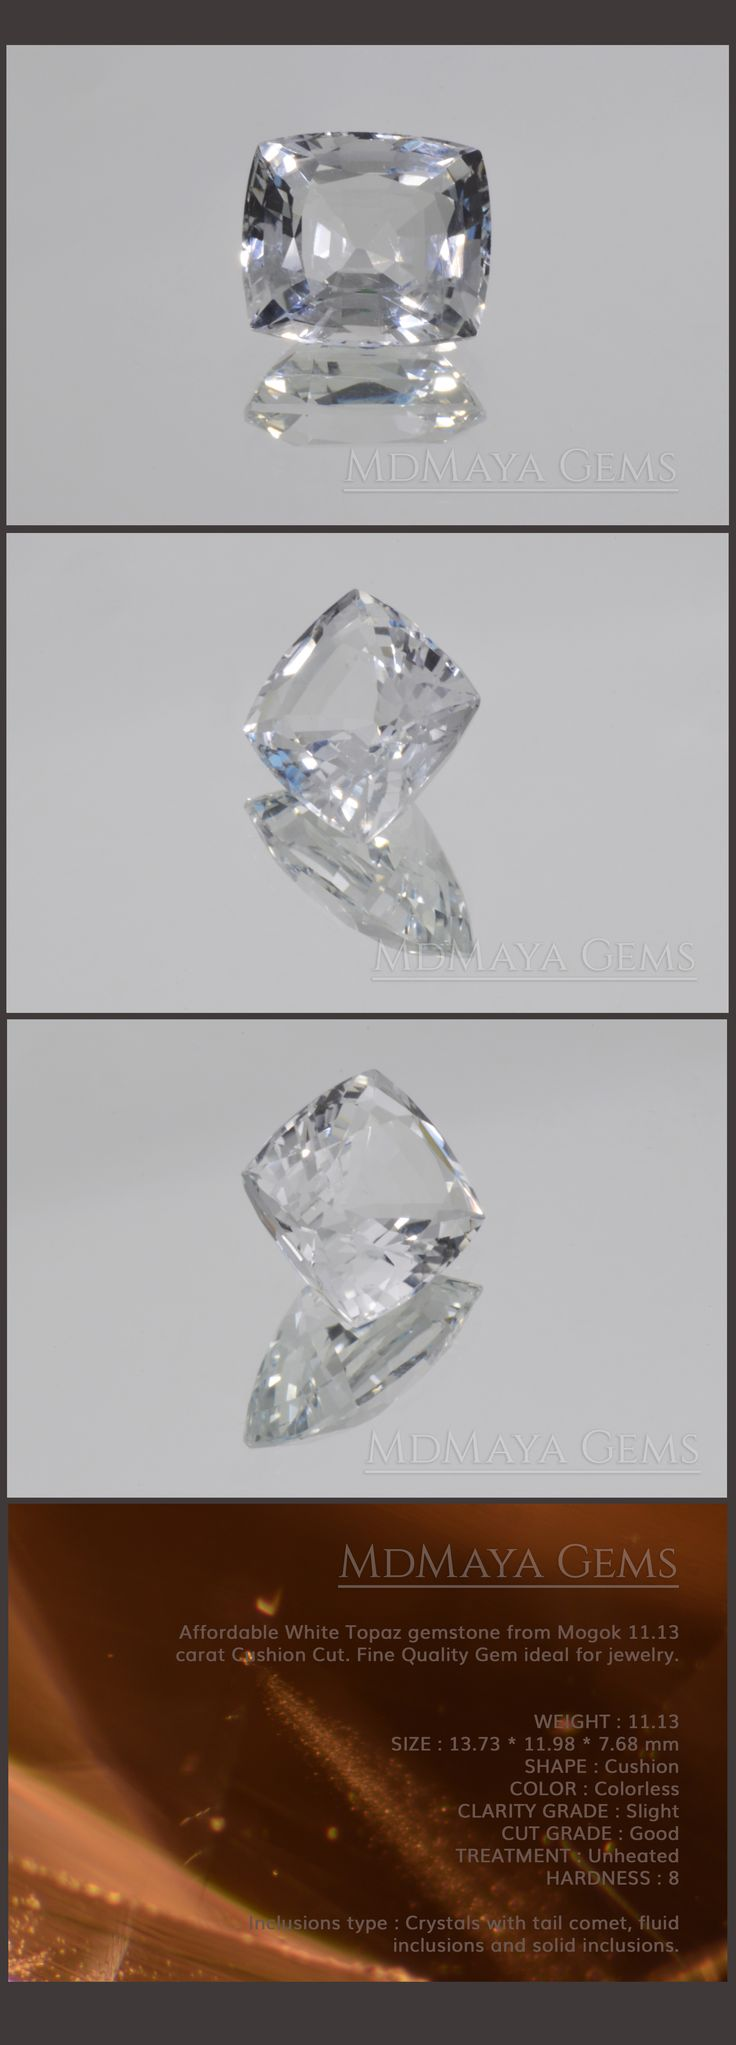 Affordable White Topaz gemstone from Mogok 11.13 carat Cushion Cut. Fine Quality Gem ideal for jewelry.